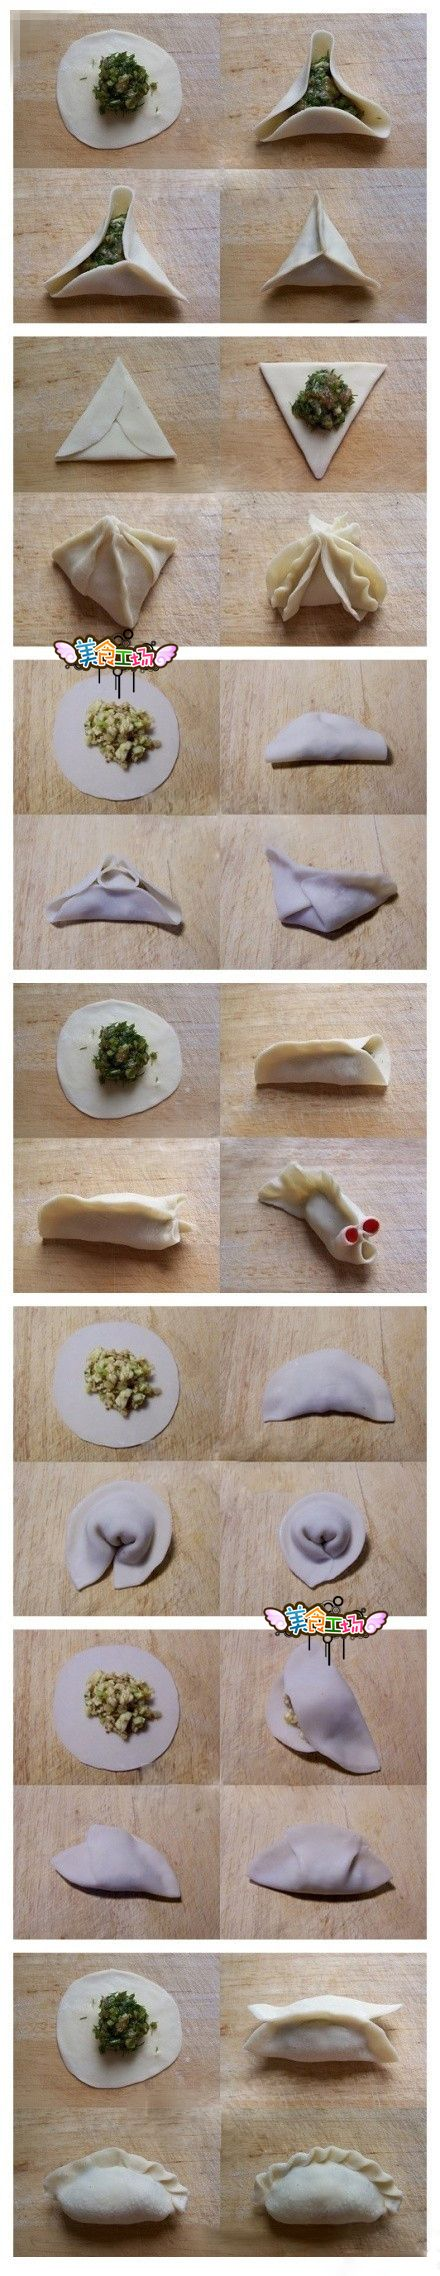 How to fold a dumpling, 7 ways【饺子的7种包法】可爱的饺子,原来你还能长成介个样子!